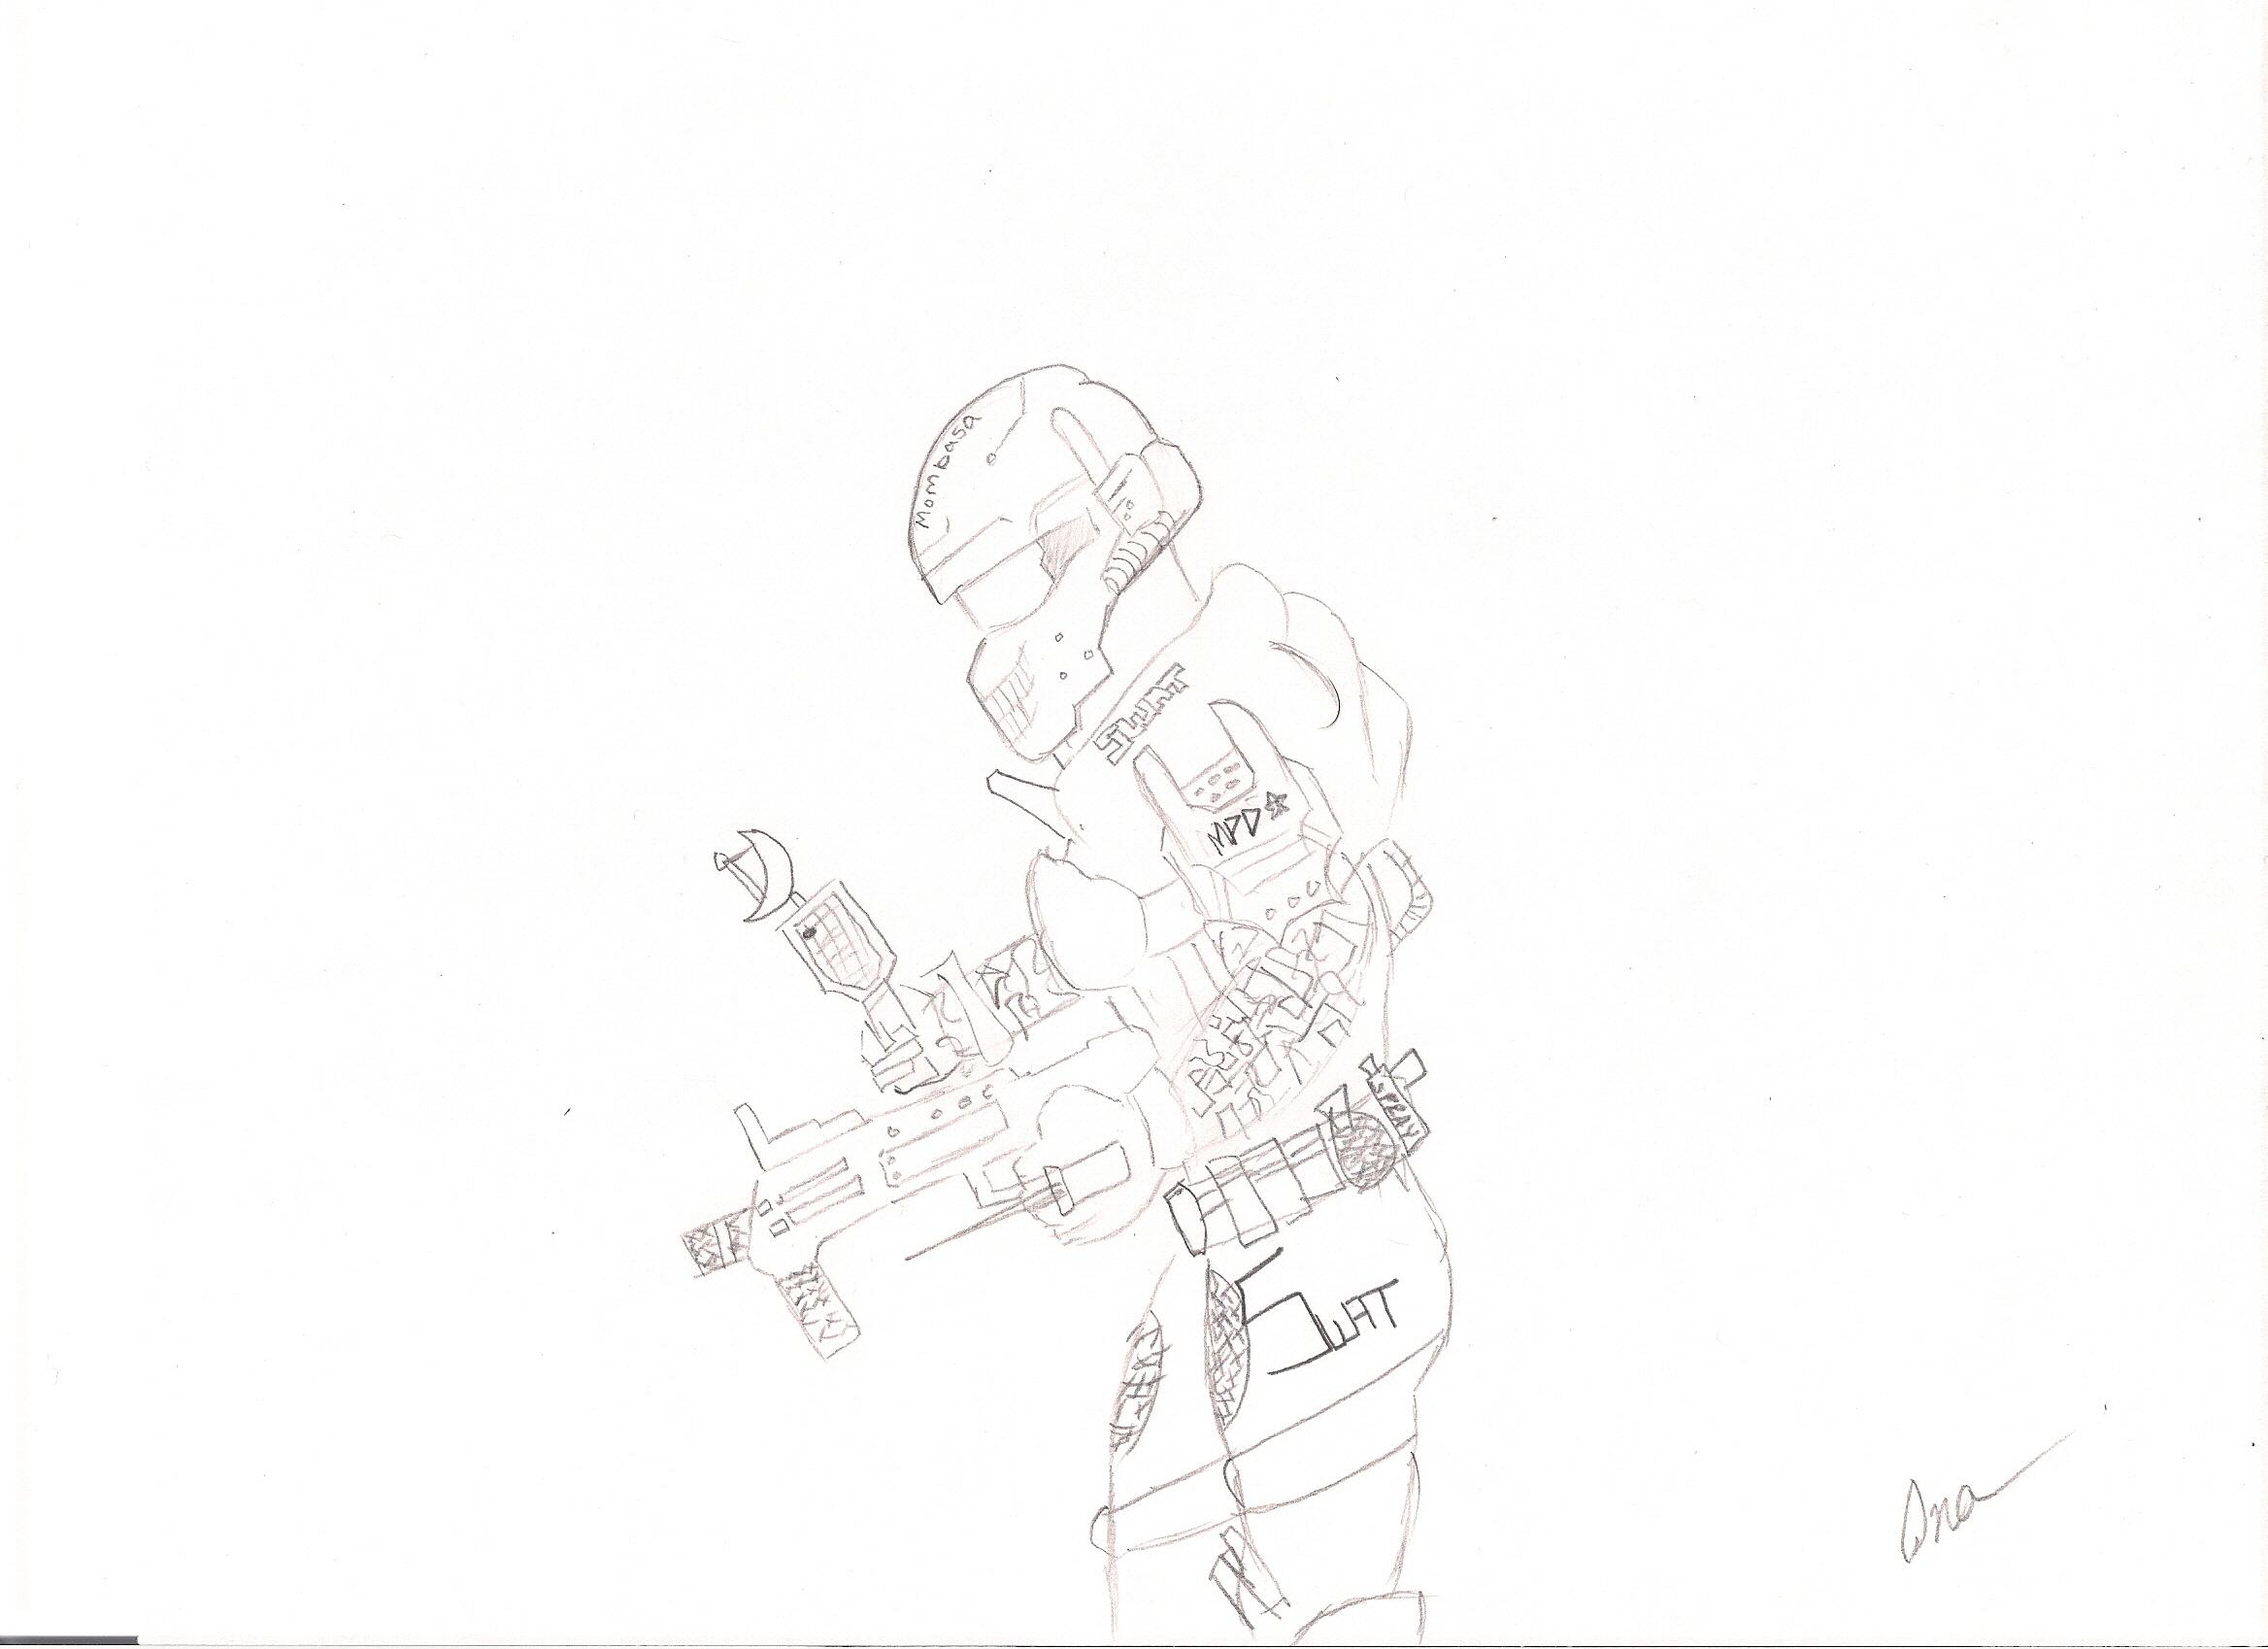 Halo Mombasa Swat Team Sketch